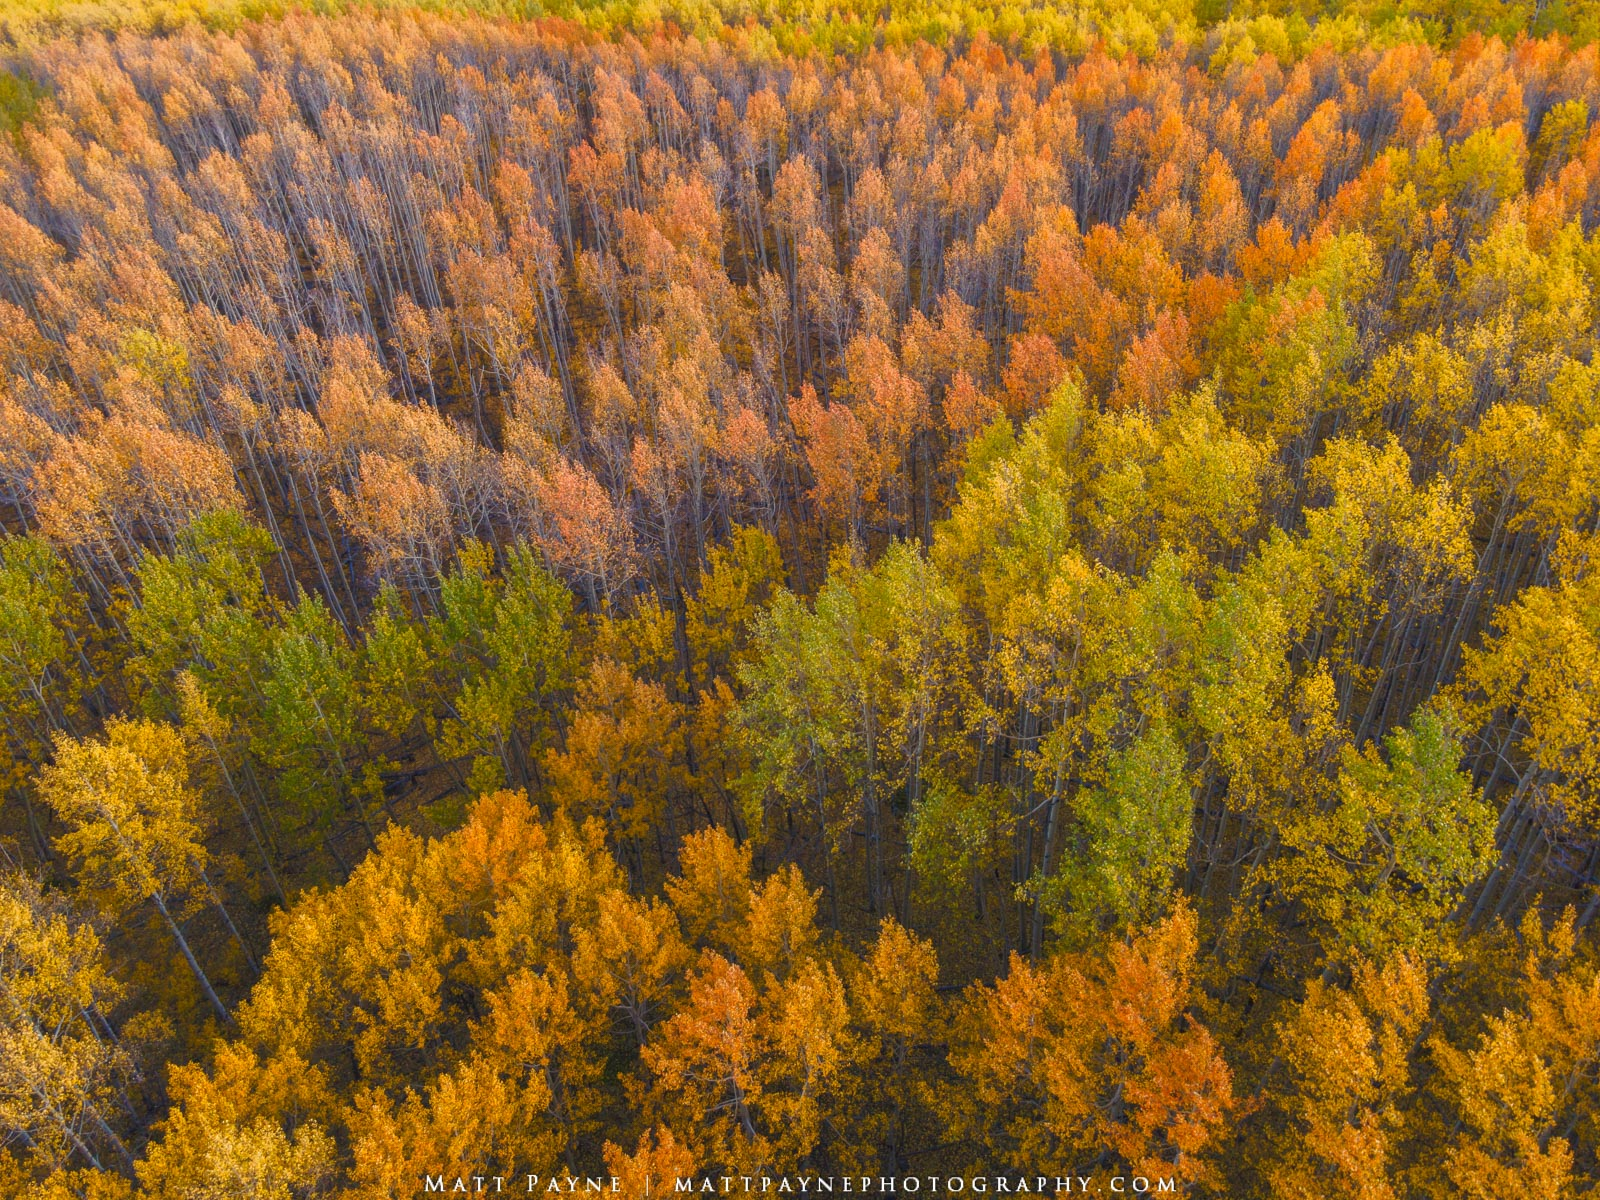 Aspen Trees, Autumn, Colorado, Fall, Fall Colors, Foliage, Forest, Landscape, colorful, landscape photography, trees, photo